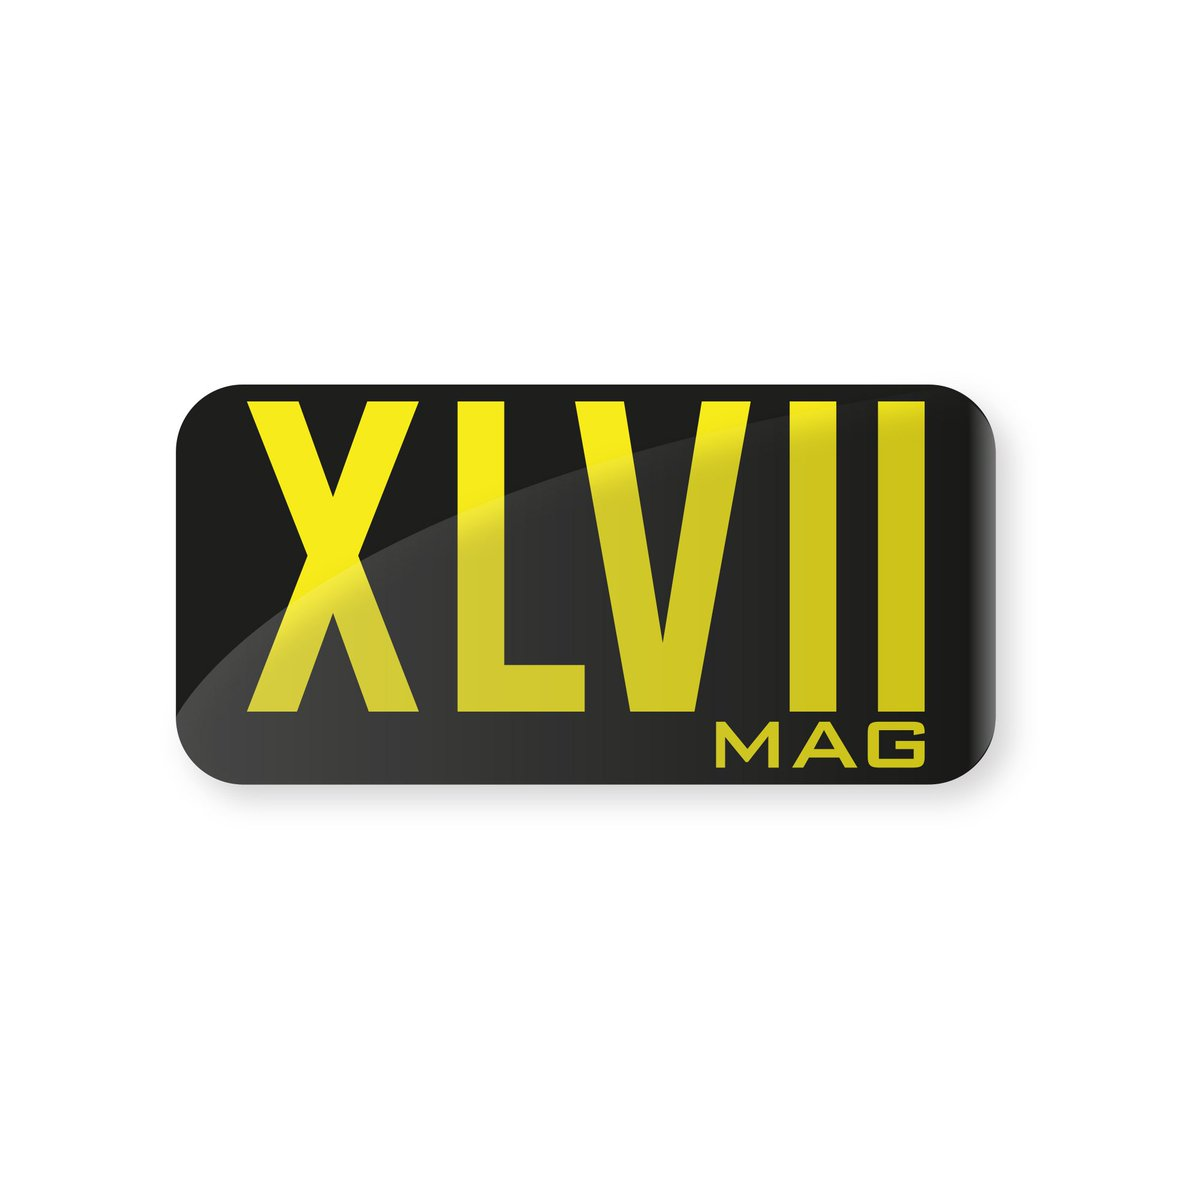 #xlviimag  Looking for #artists &amp; #music #producer, #singers, #edm, #djs #musicnews #soundcloud  Email: xlvii@gmail.com<br>http://pic.twitter.com/xu0l9j9baG